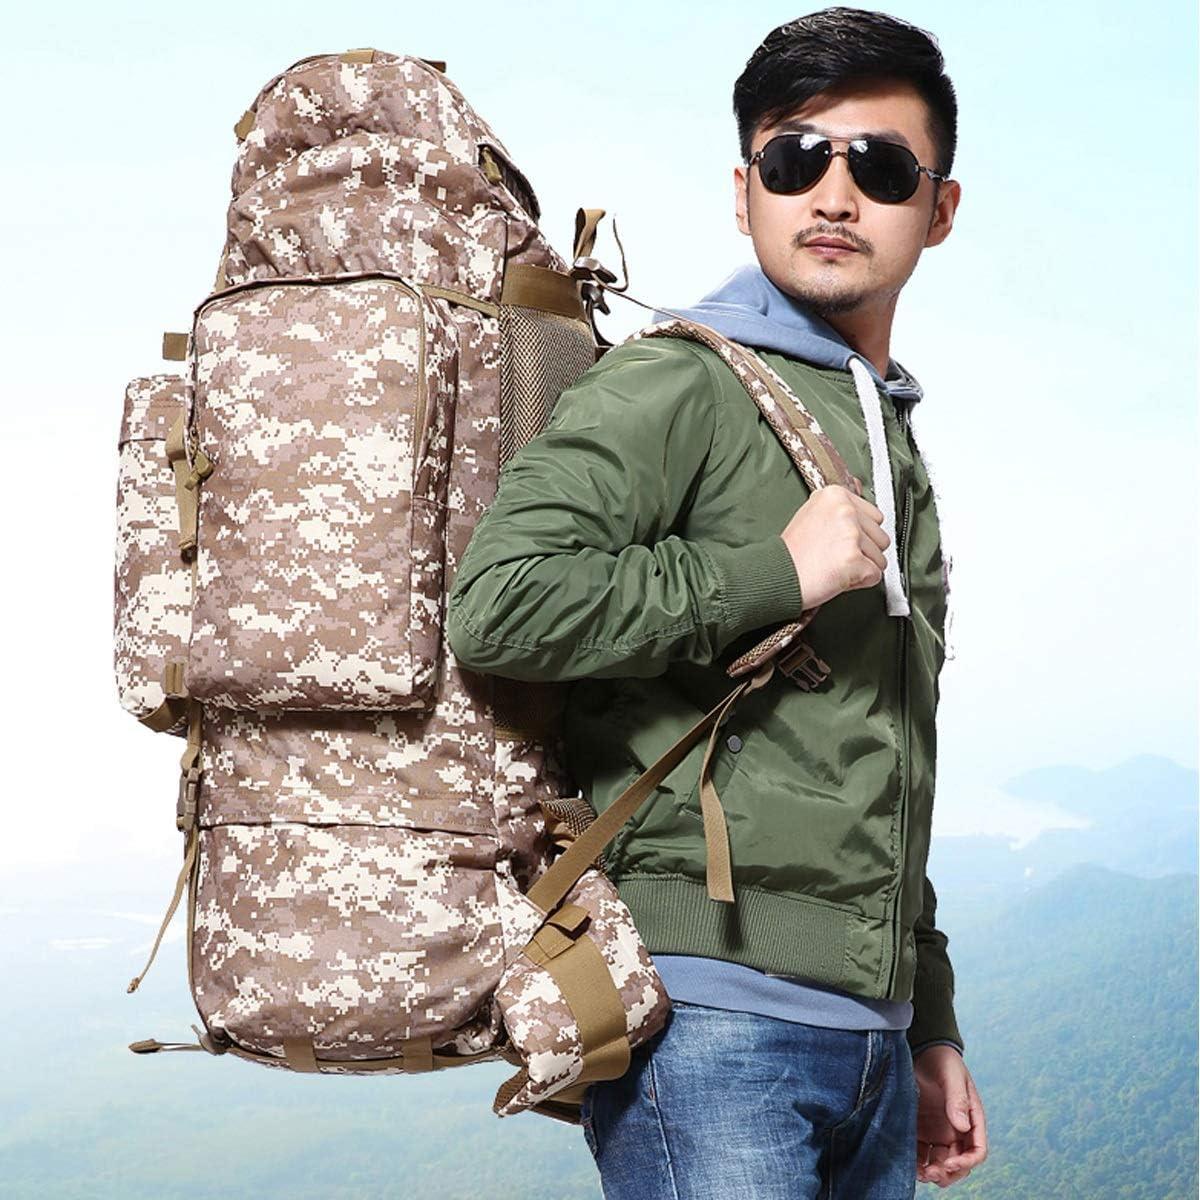 Duffel Bag 20-inch Handbag Canvas Shoulder Bag Xiaoningmeng Mountaineering Bag Brown Travel Essential Color : Rainforest Camouflage, Size : 70L